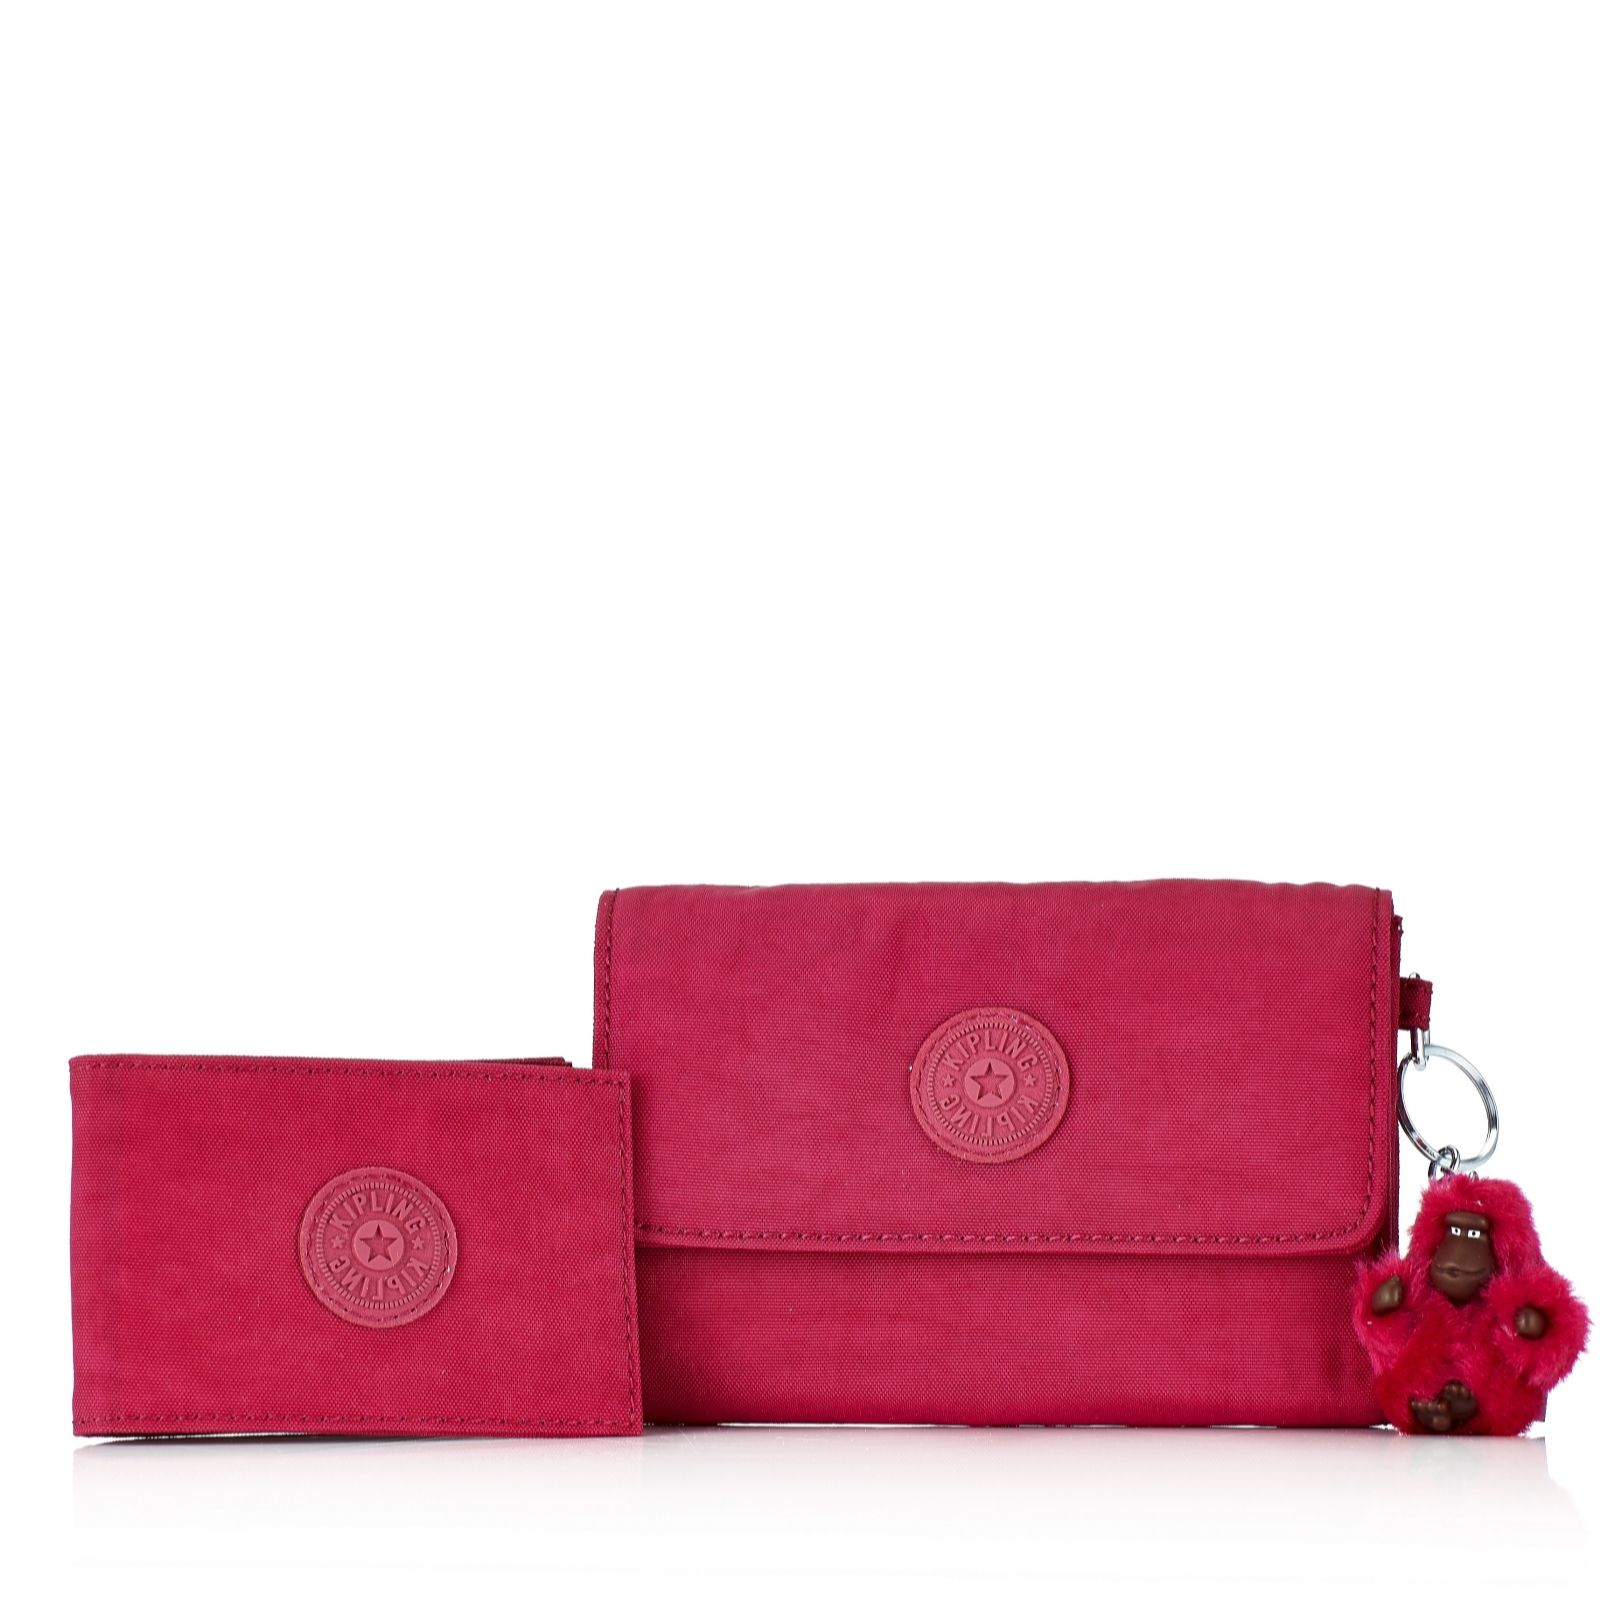 kipling new pixi purse  card holder set  page 1  qvc uk